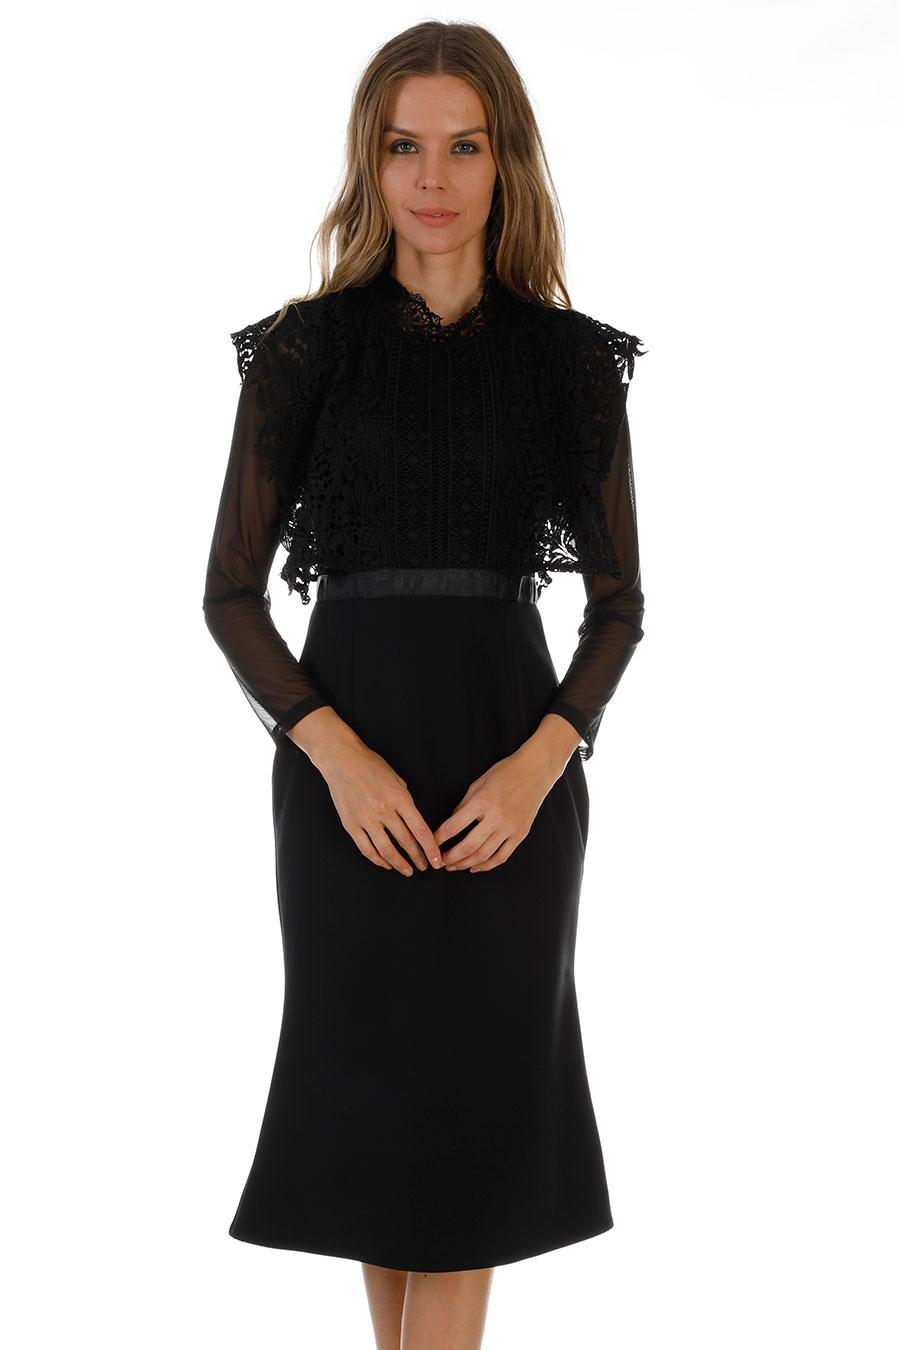 bba46f44842 Milan Fashion e-pood – Naiste kvaliteet-riided